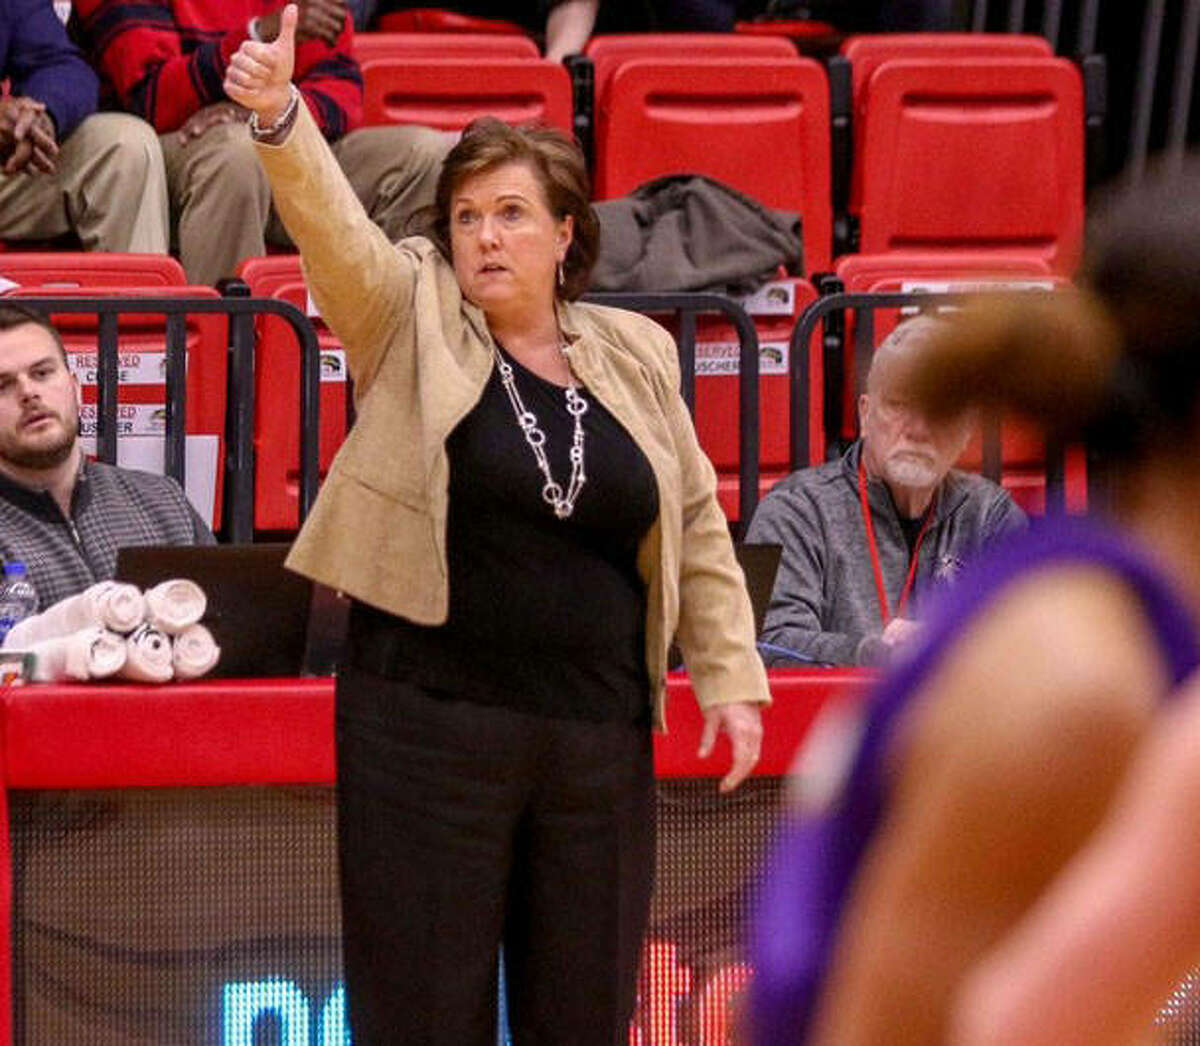 SIUE women's basketball coach Paula Buscher signals a play into her team during a game last season.